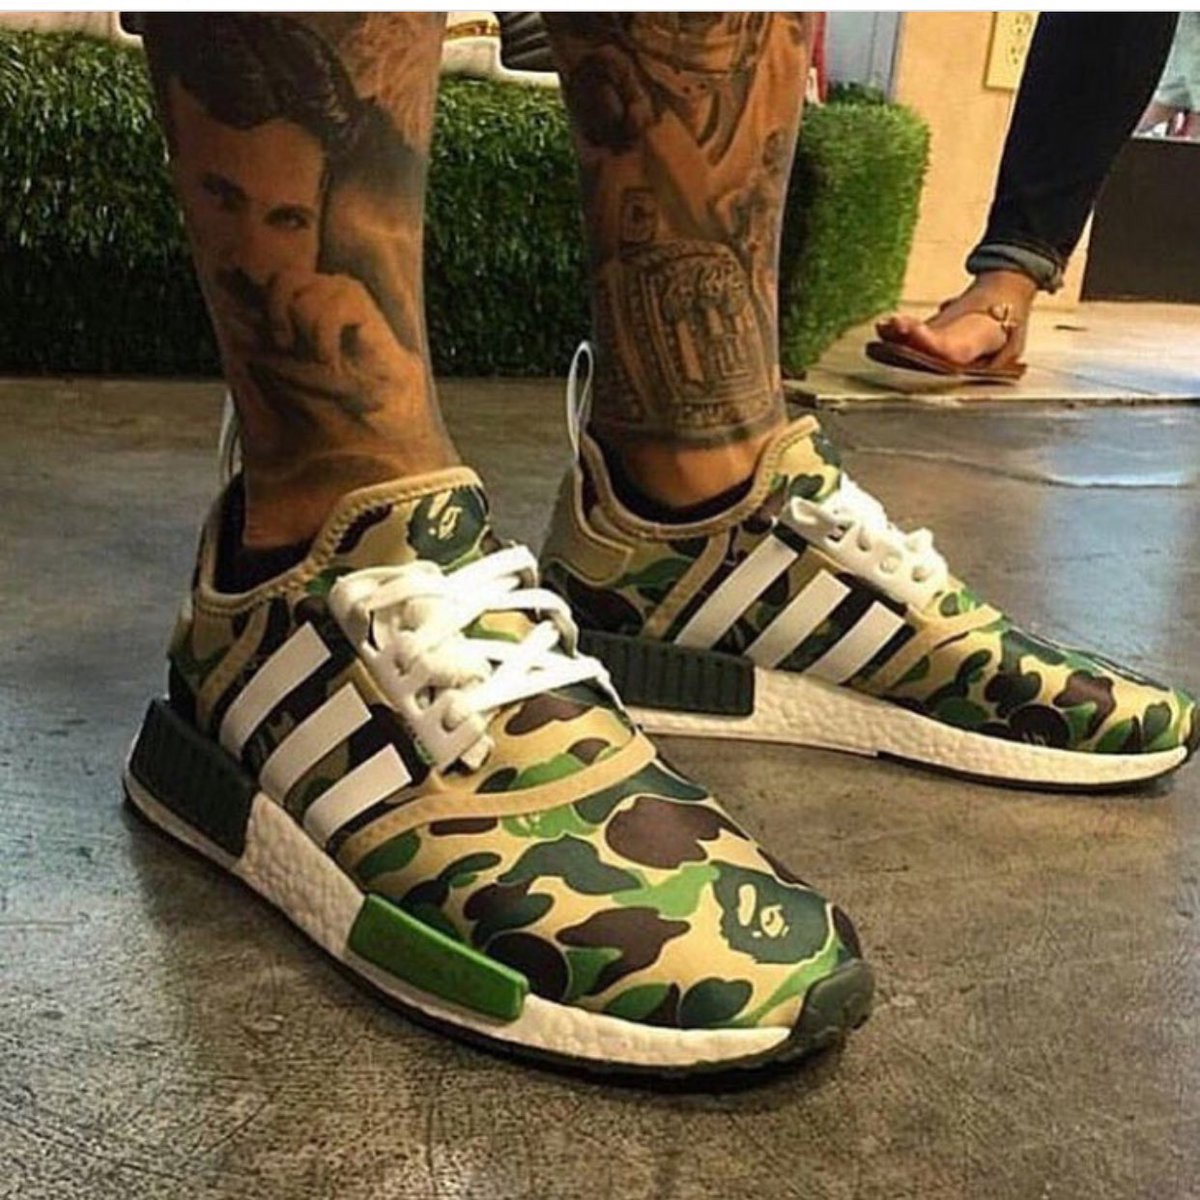 0e457c7716f26 Sneakers Hunter on Twitter